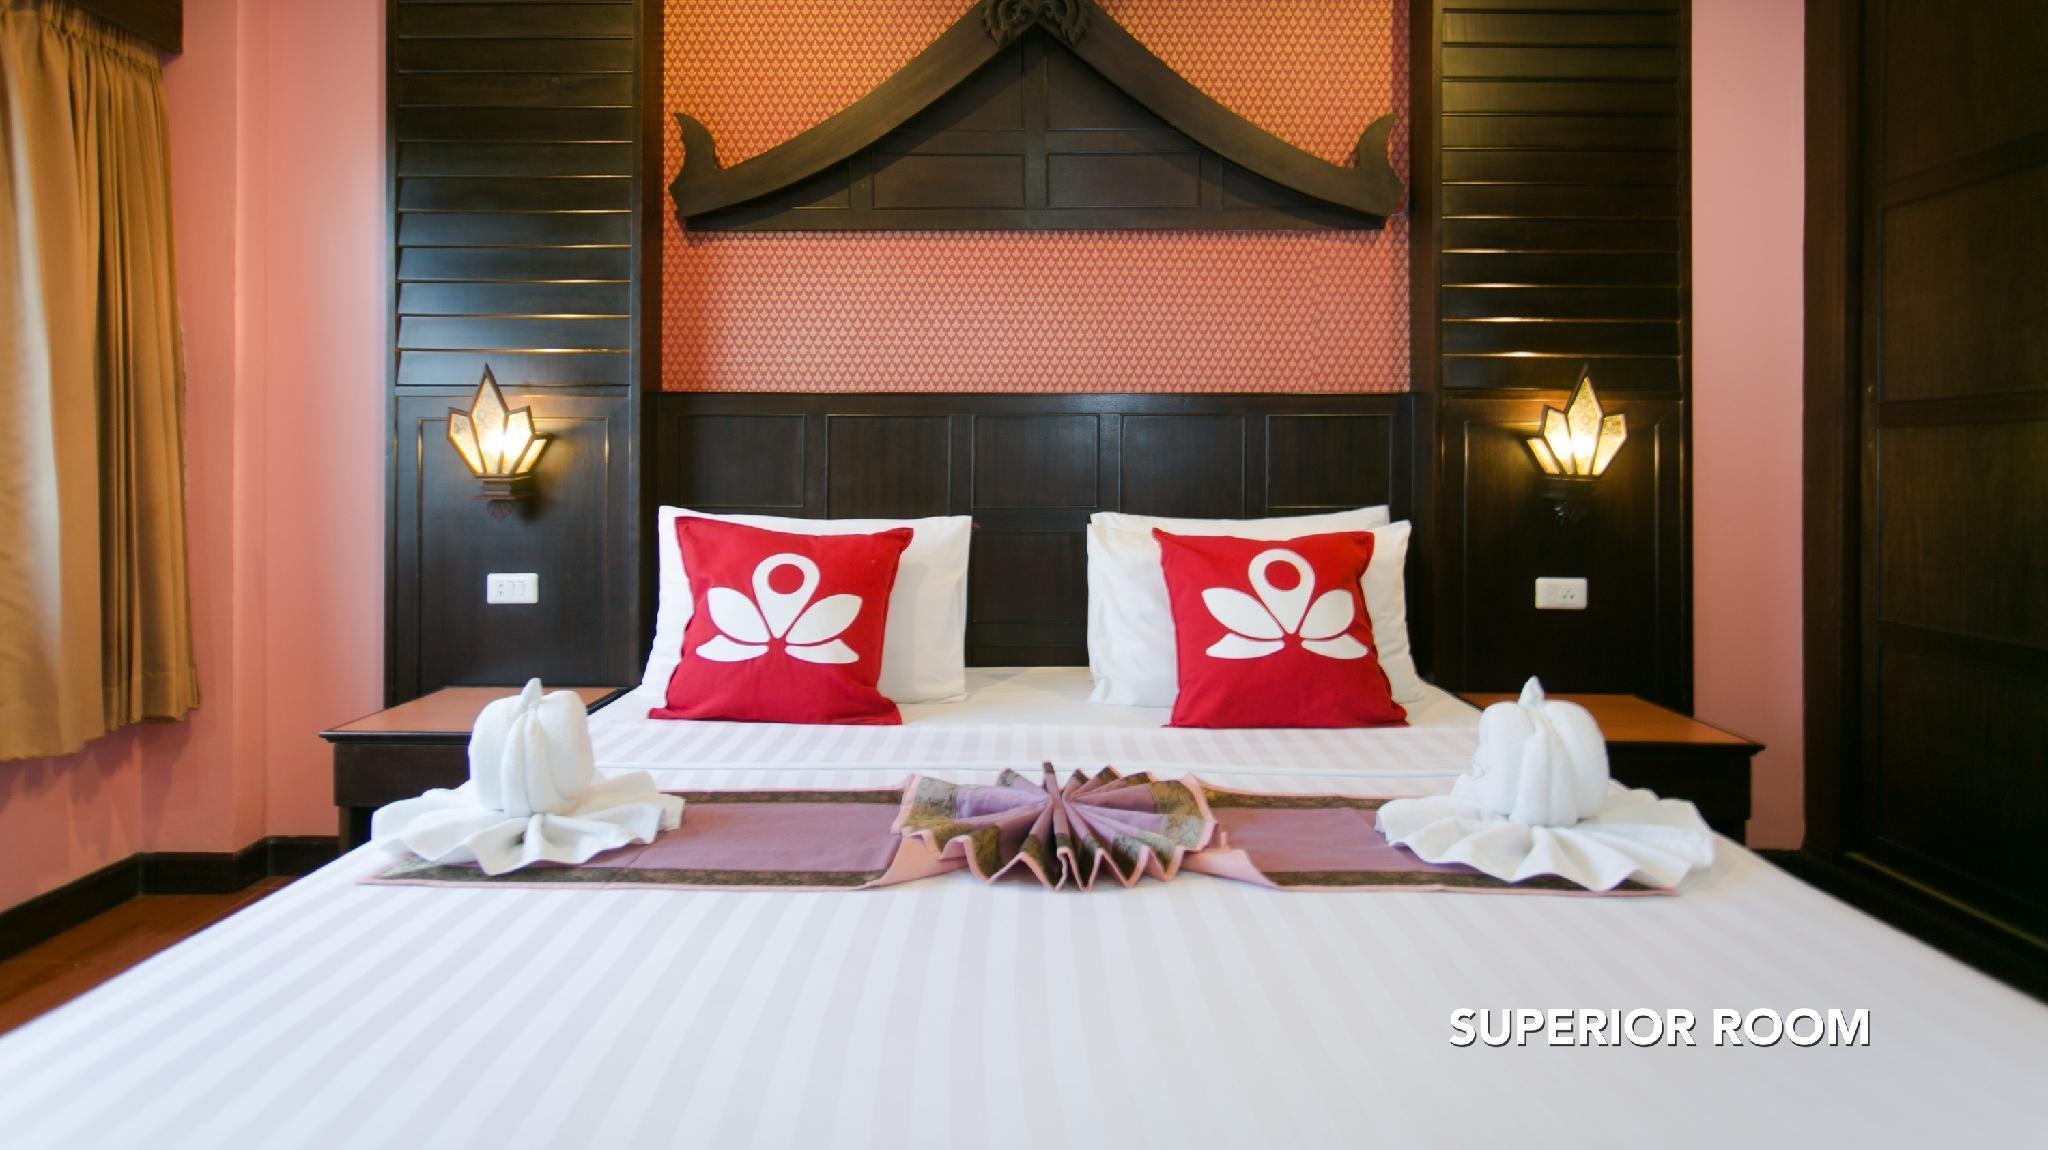 ZEN Rooms Nanai Soi 2 เซ็น รูม นาใน ซอย 2